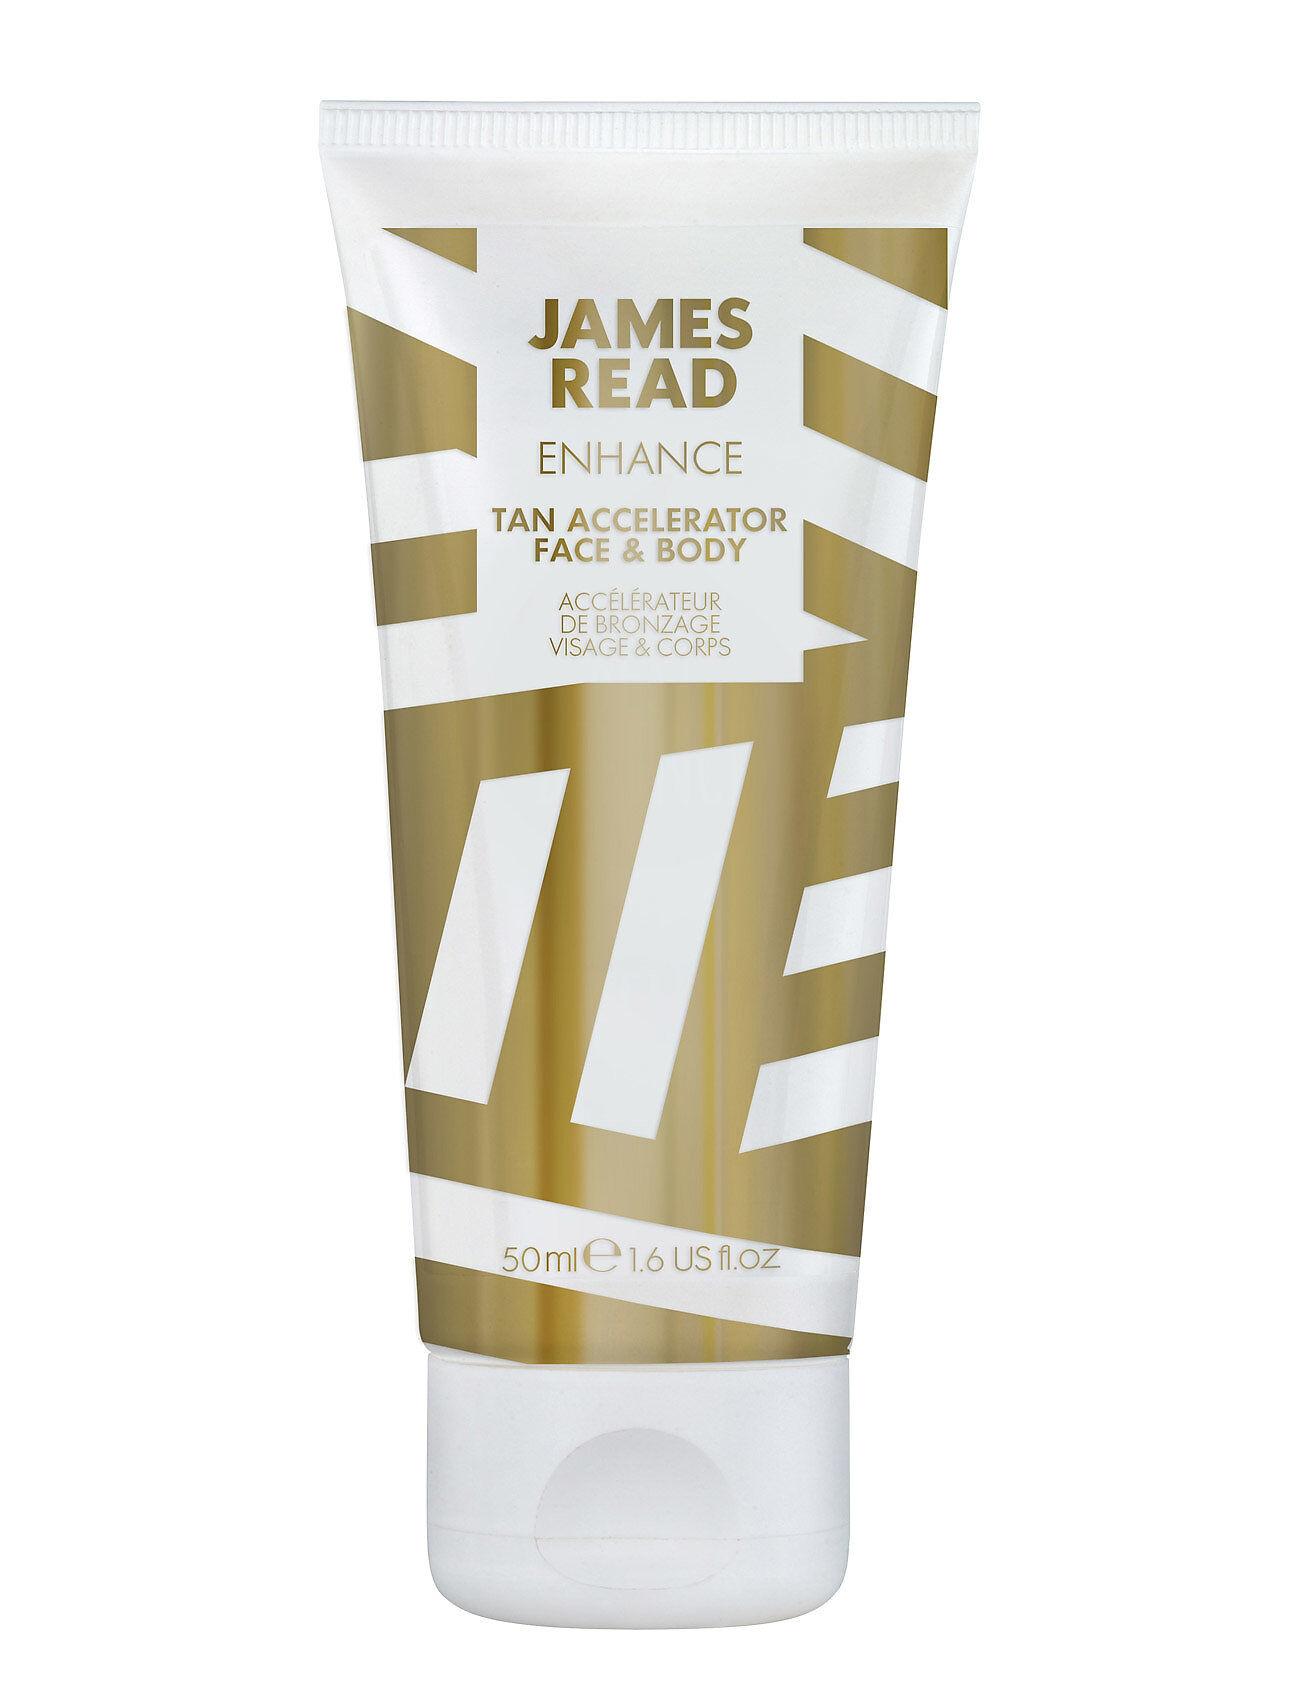 James Read Tan Accelerator Beauty WOMEN Skin Care Sun Products Self Tanners Nude James Read